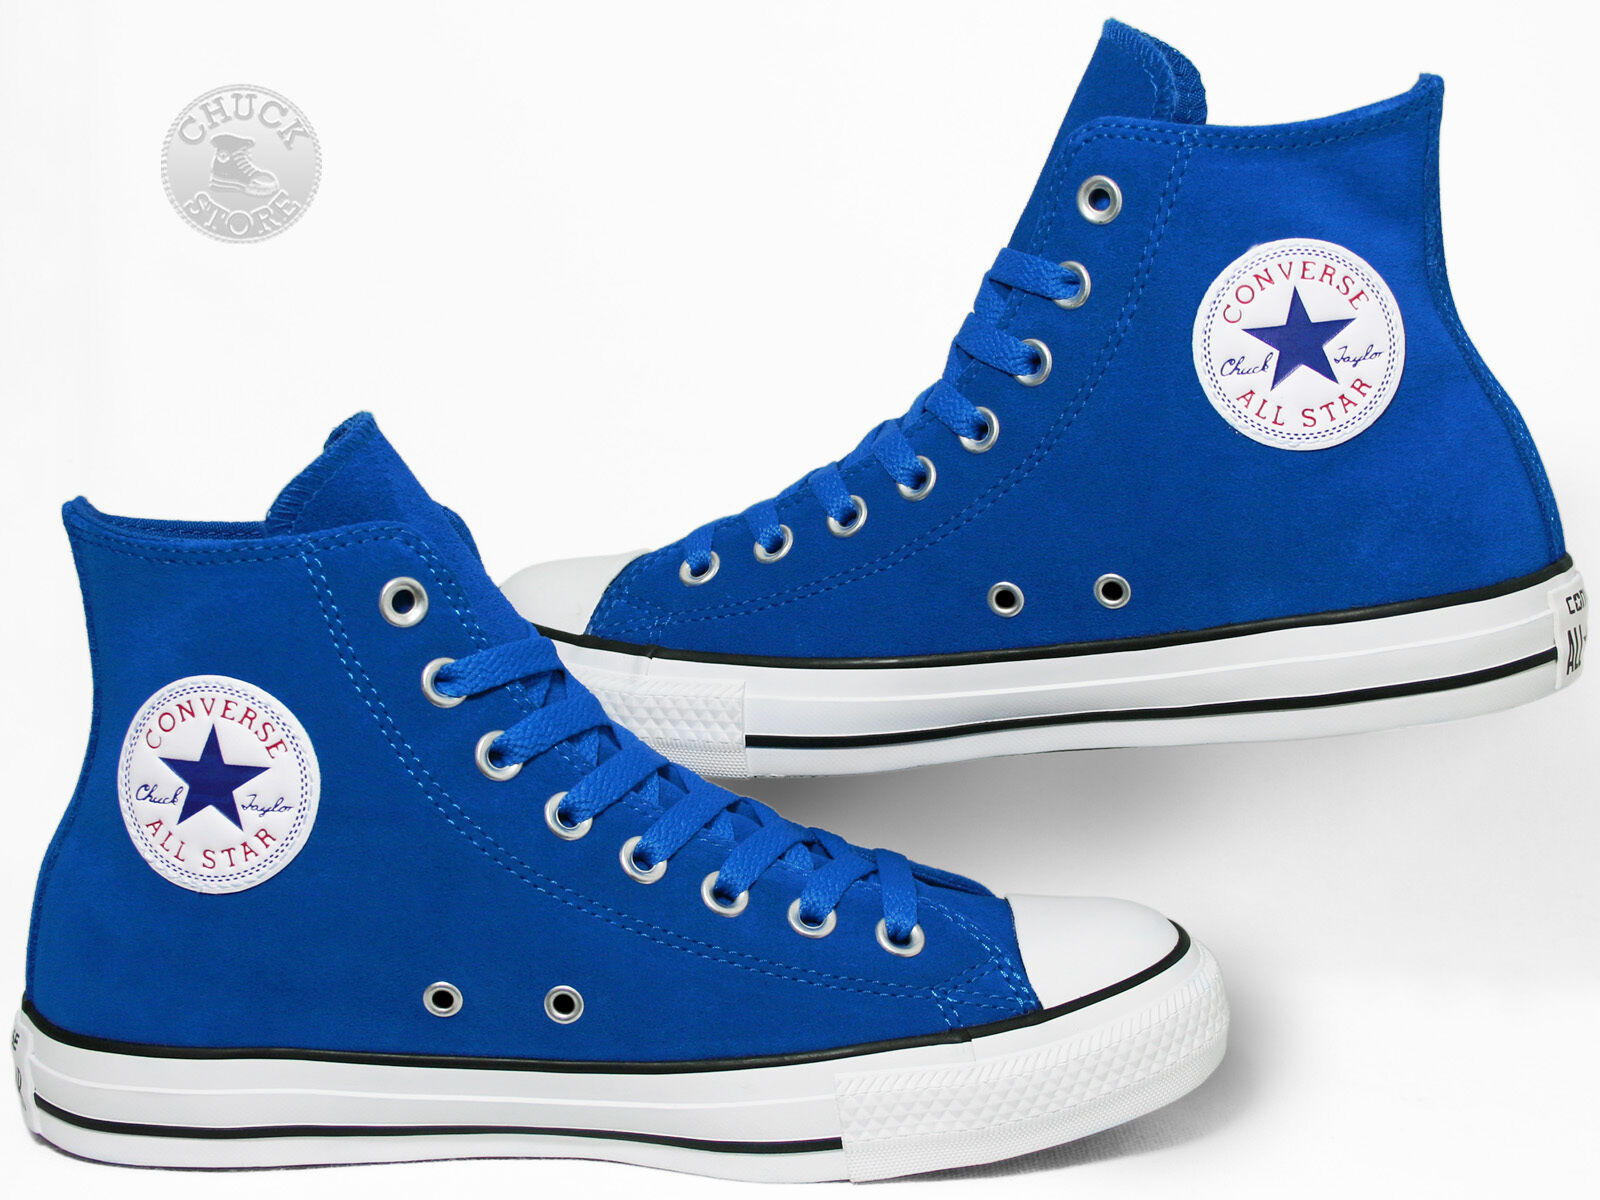 Converse Chuck Taylor All Star Chucks Hi Suede Larkspur / Blau 144673C Sneakers